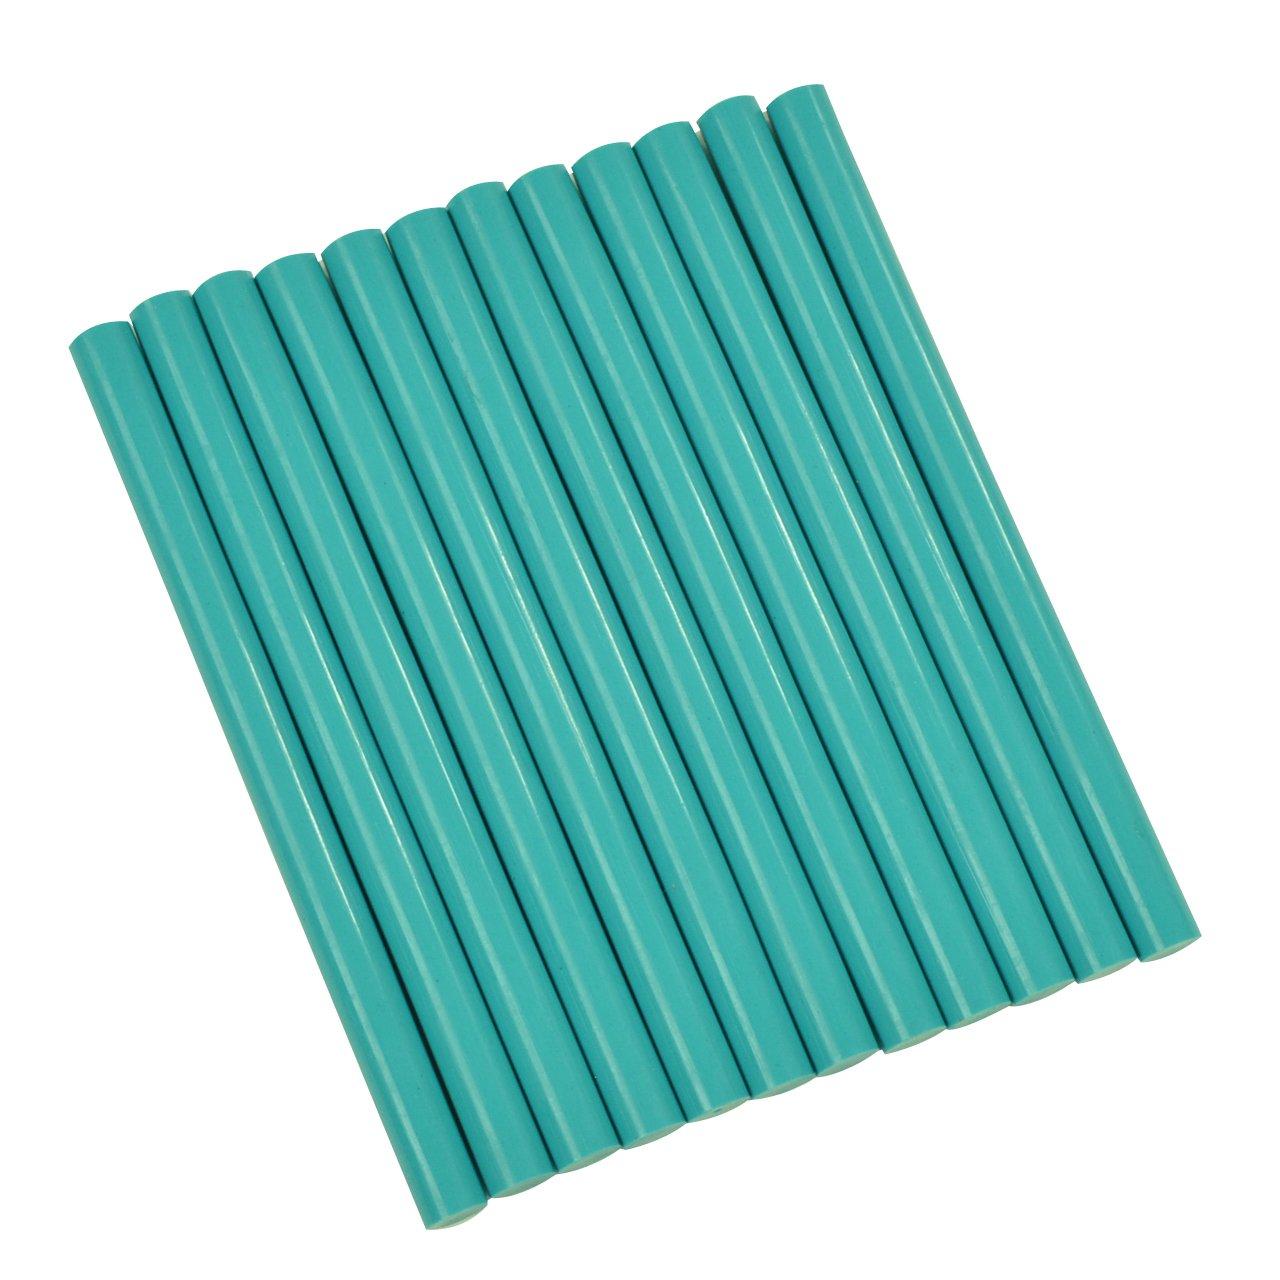 GlueSticksDirect Teal Colored Glue Sticks Mini X 4 12 Sticks